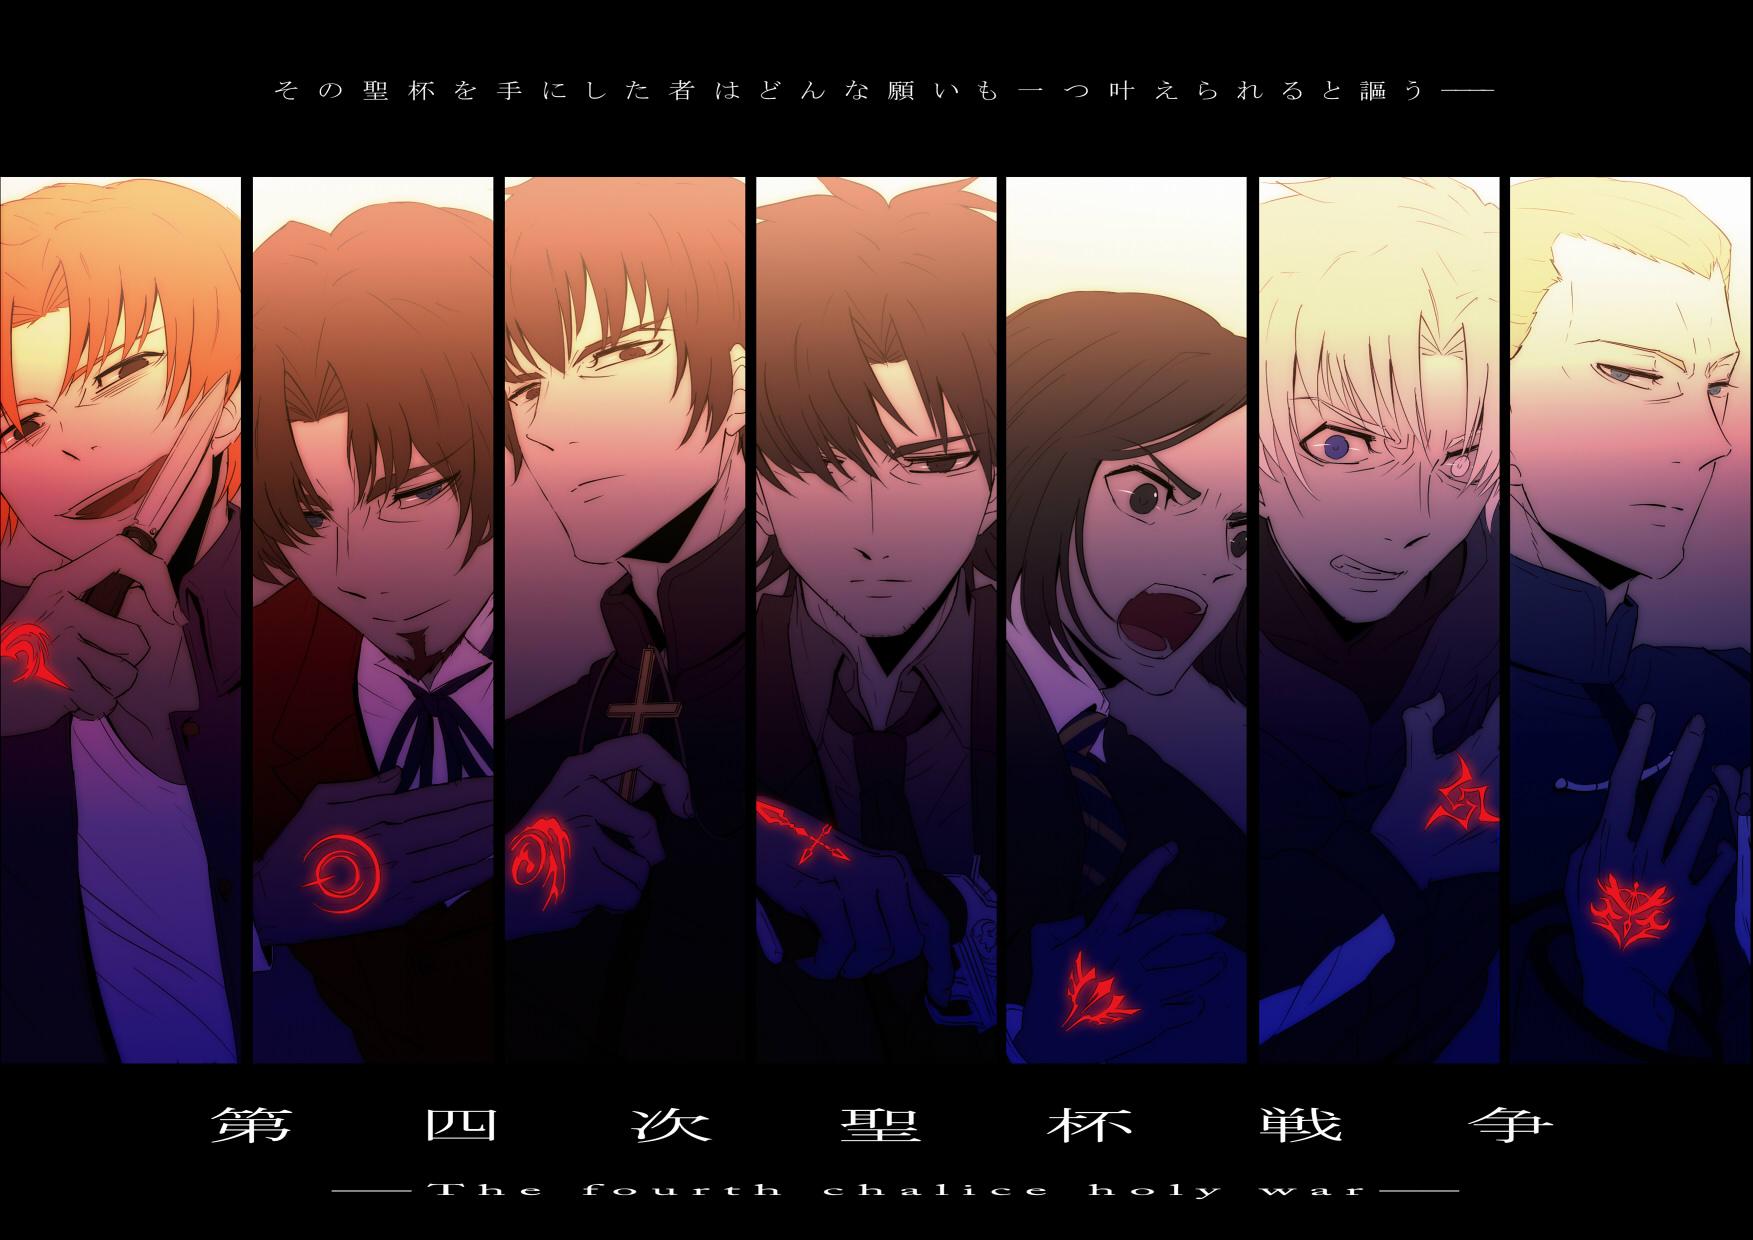 182797 - Un género, un anime - Hablemos de Anime y Manga